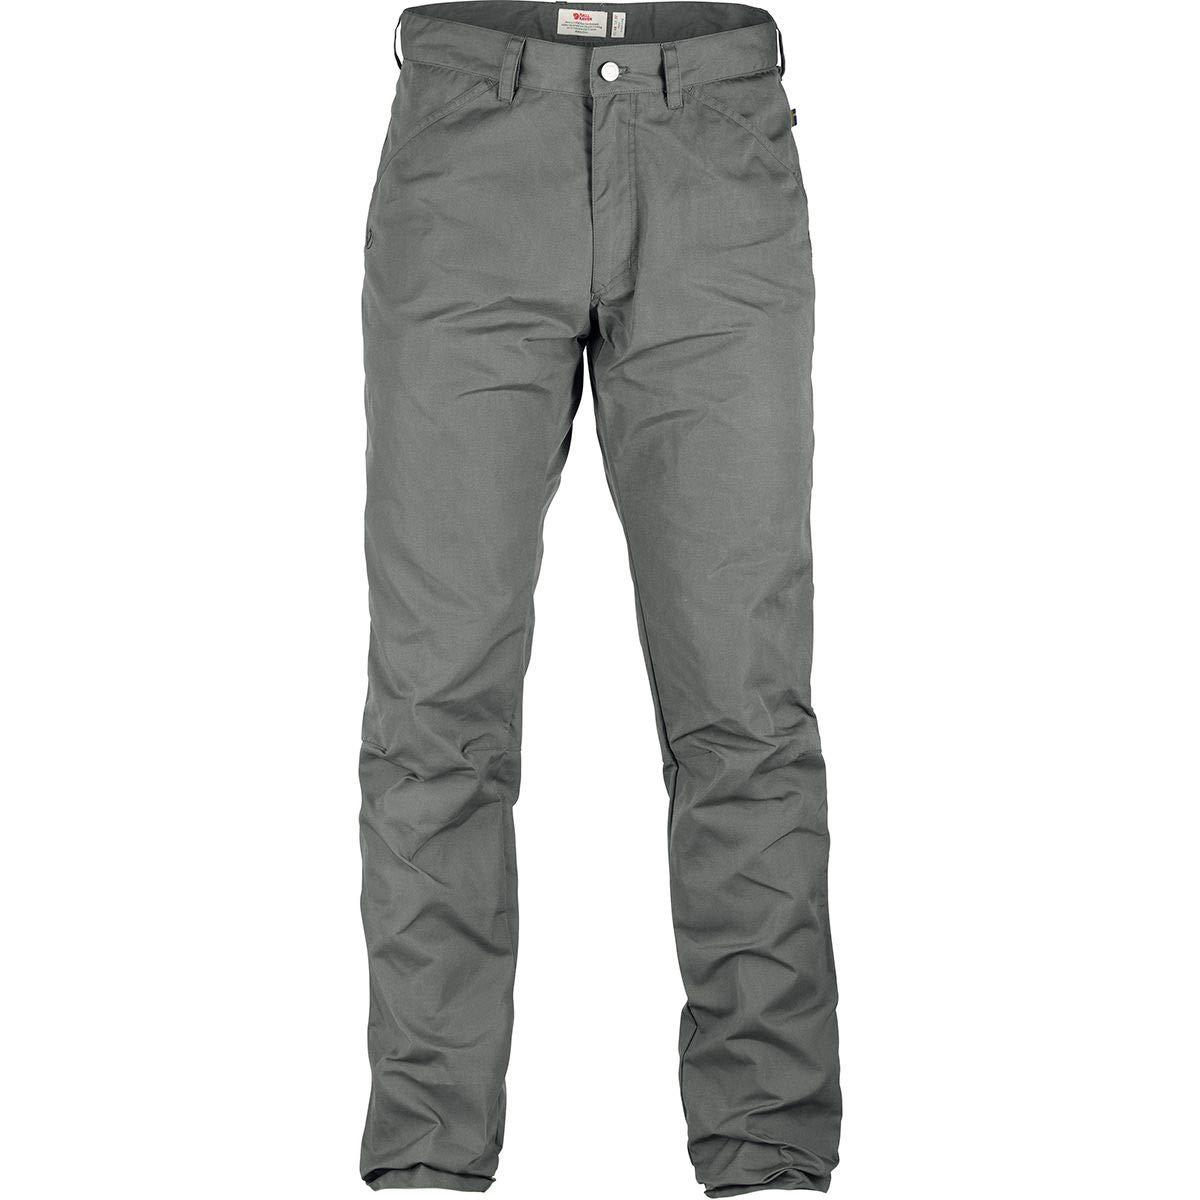 FJ/ÄLLR/ÄVEN High Coast Fall Trousers Pantalones Unisex Adulto